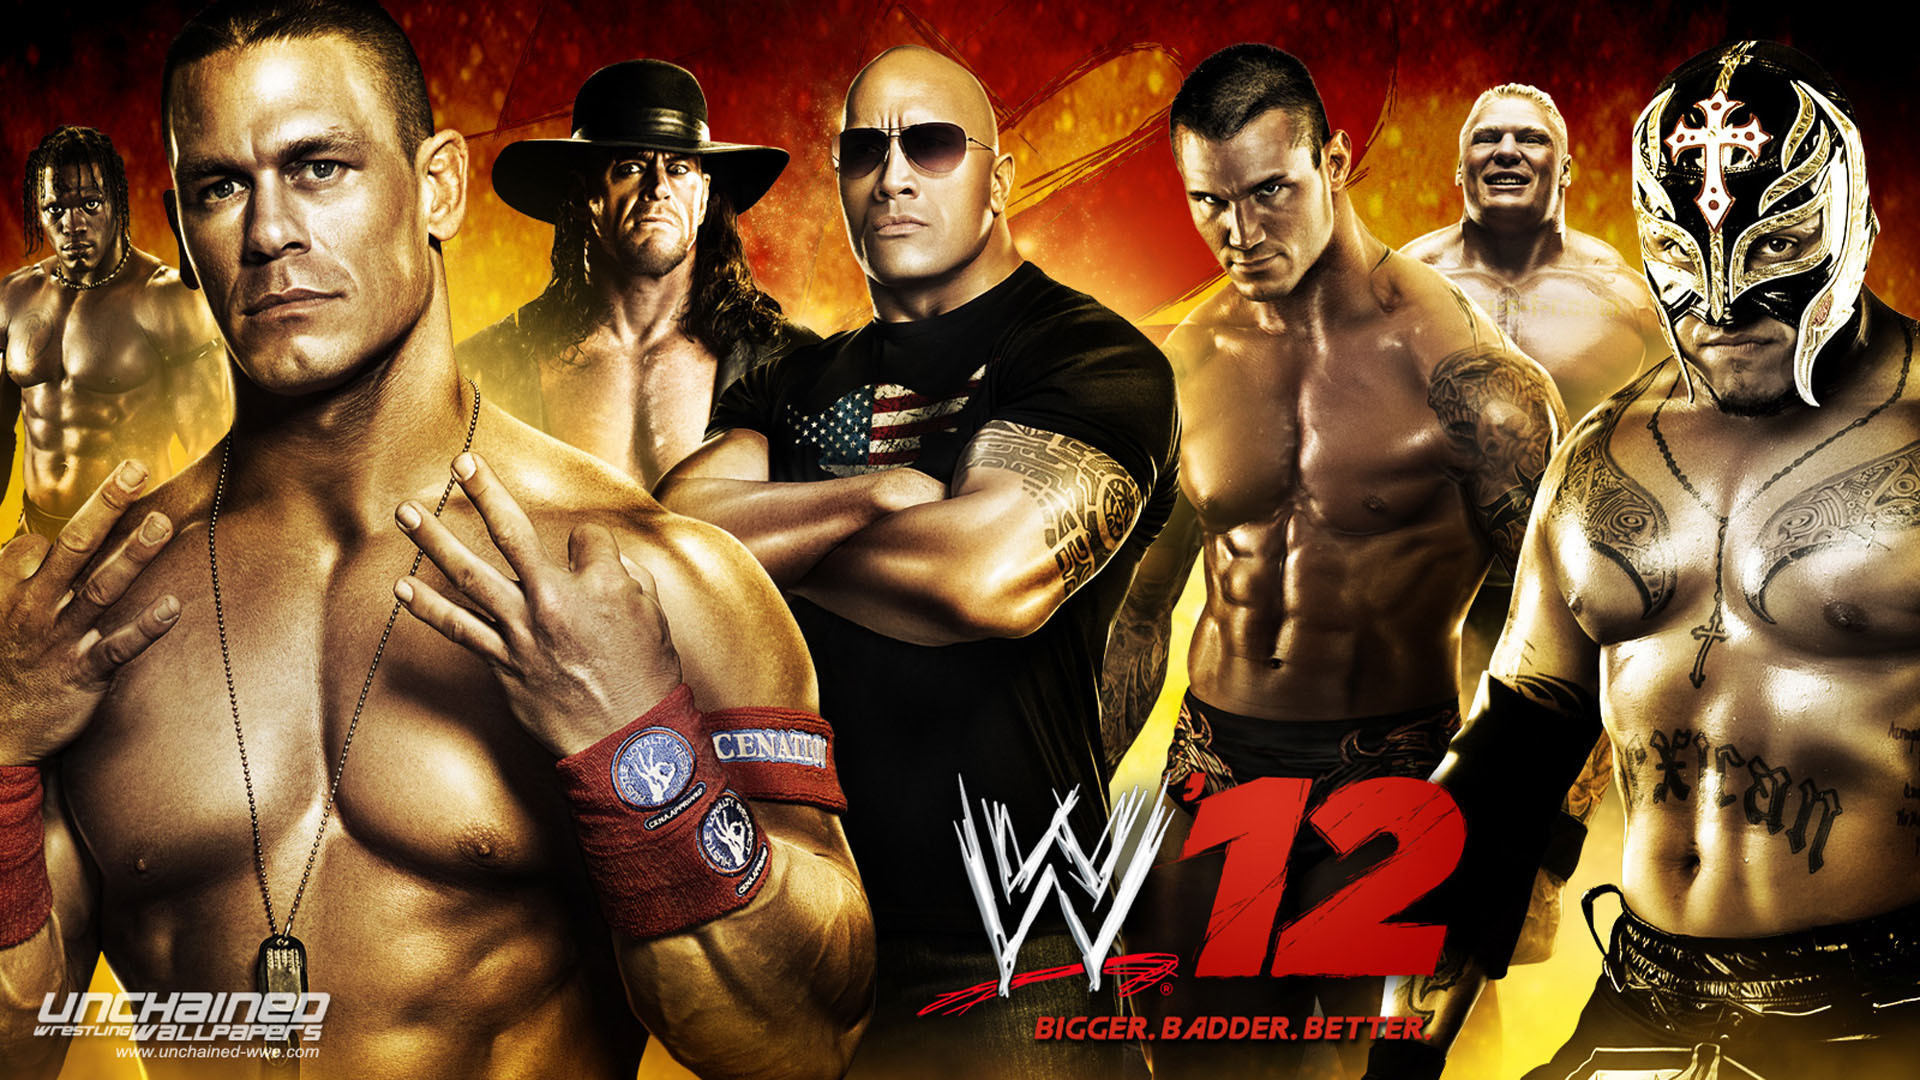 WWE John Cena Wallpaper Pics Of John Cena Wallpapers Wallpapers)